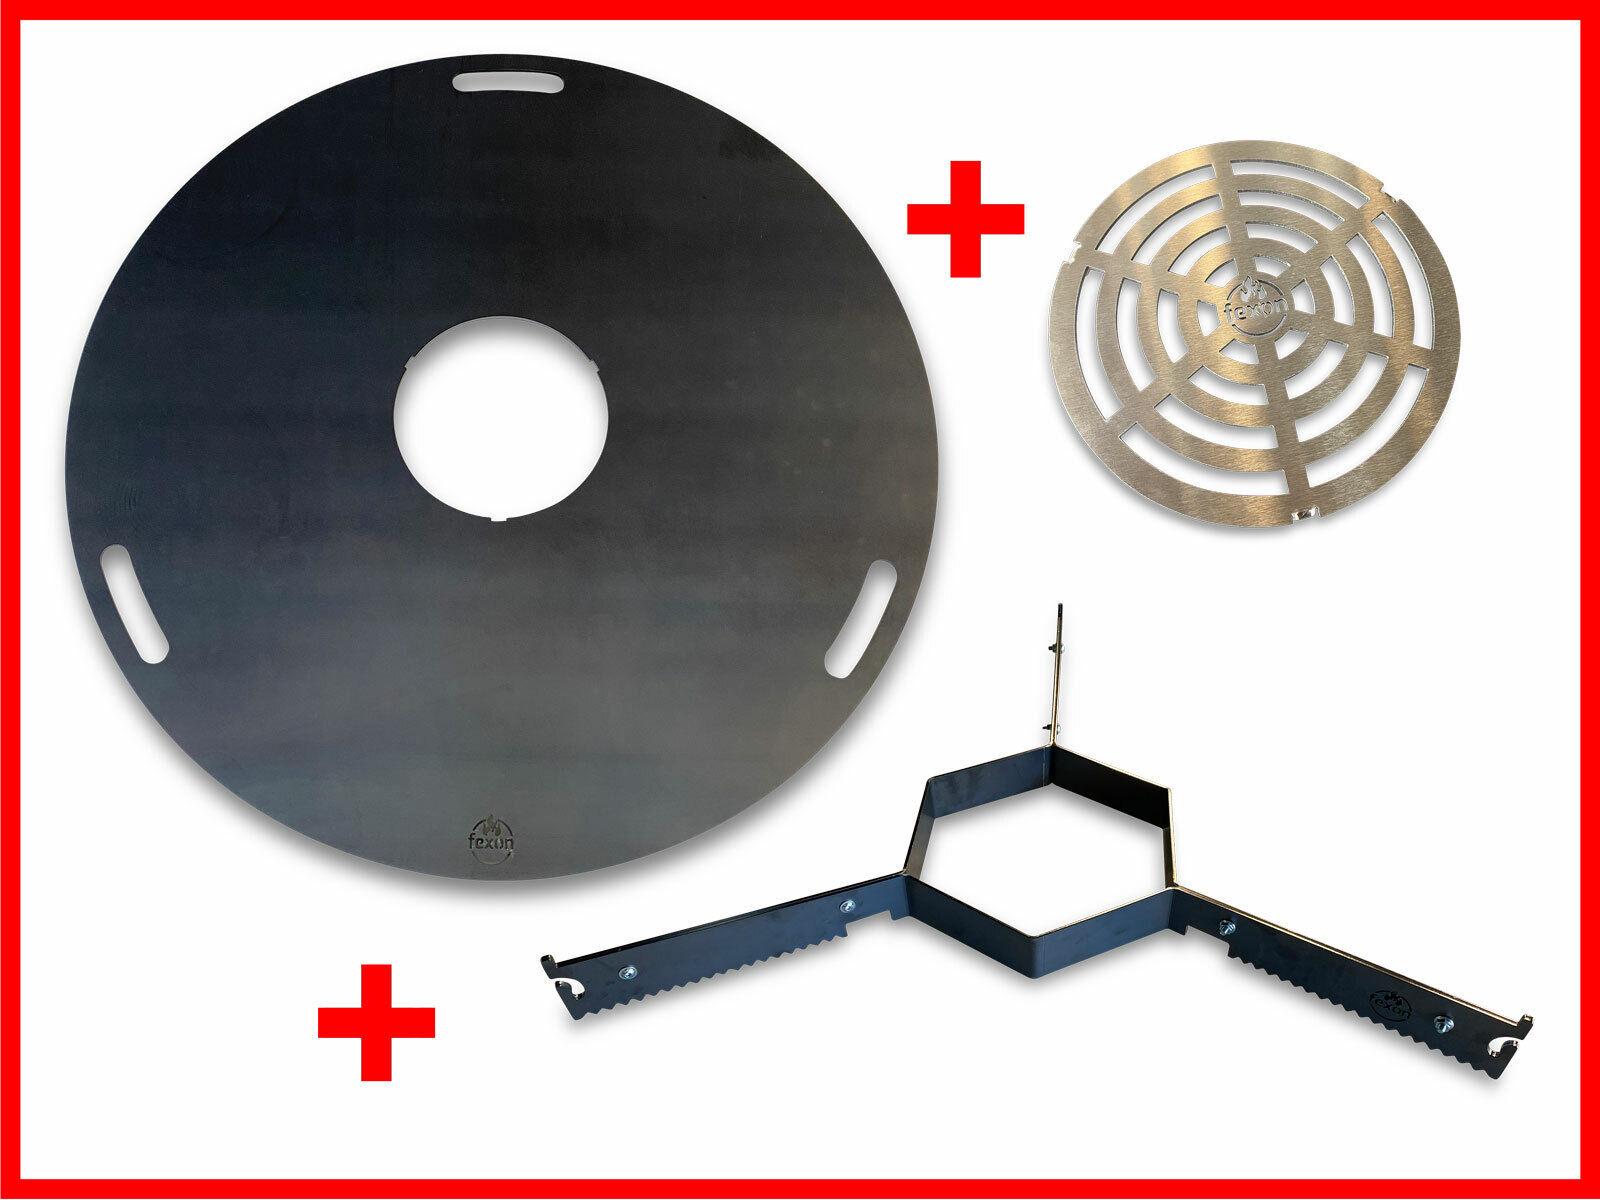 Komplett Set Feuerplatte 80 o. 100cm + VA Grilleinsatz + Abstandshalter Plancha